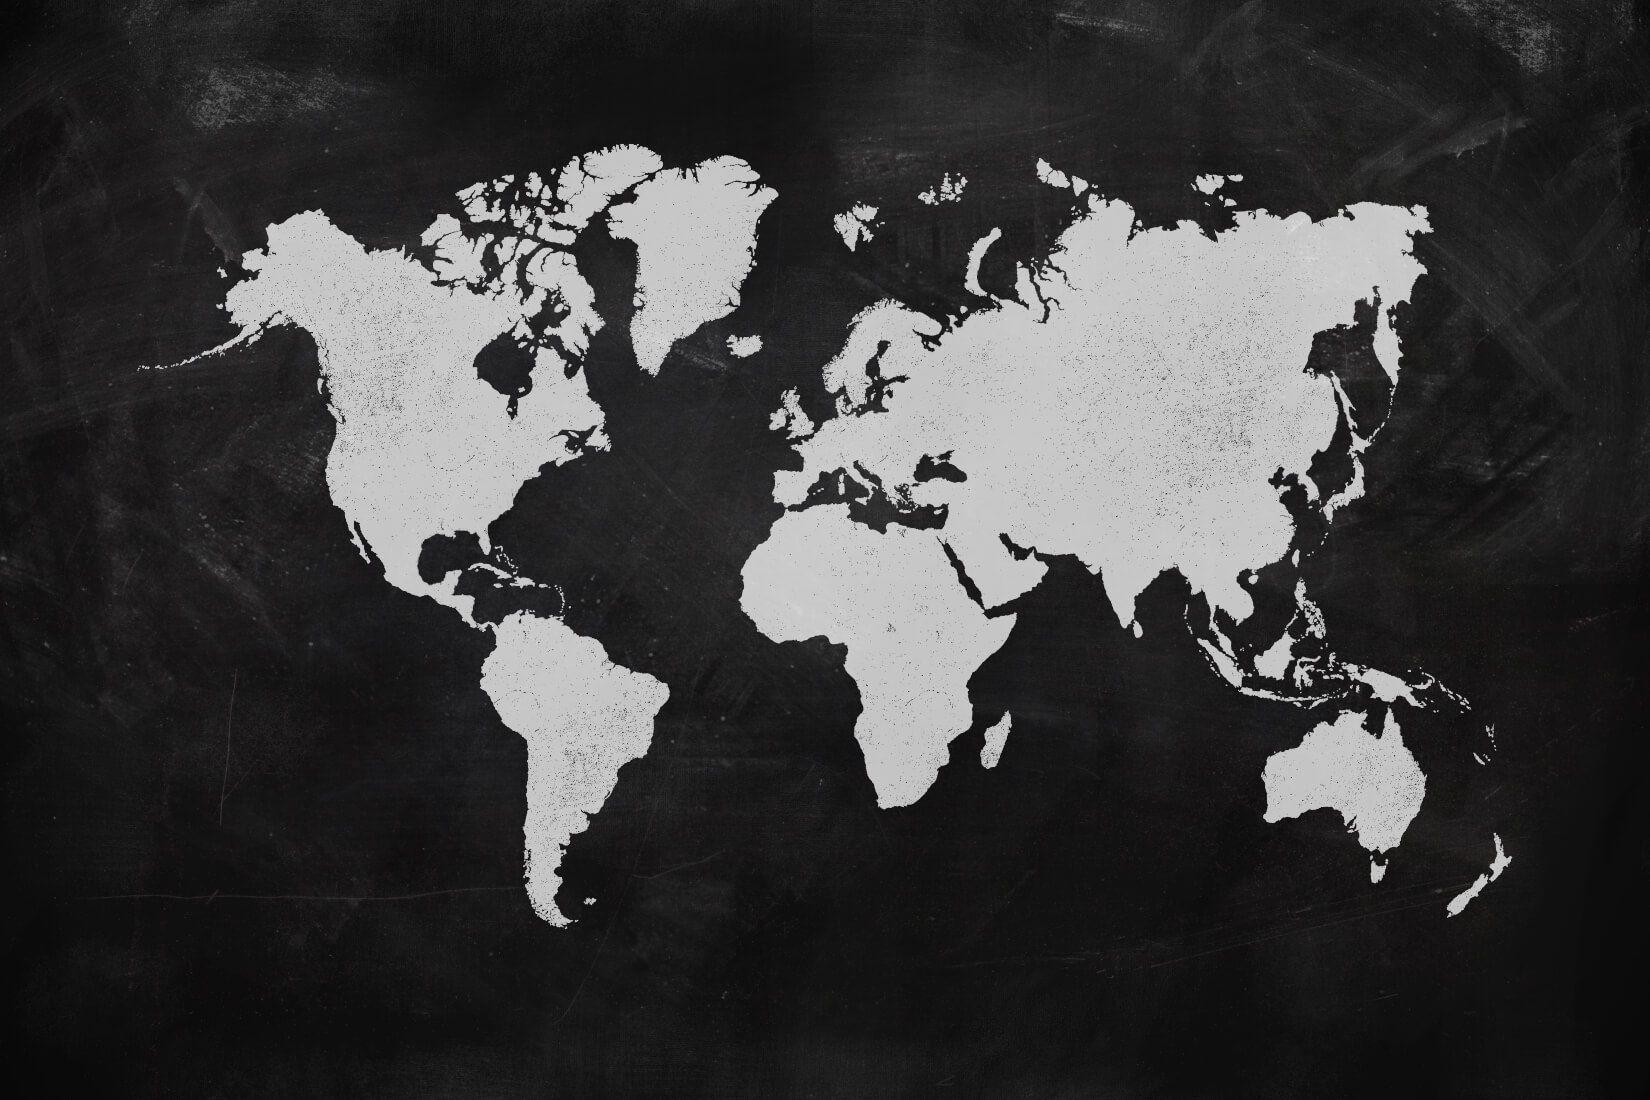 Black World Map Wallpaper Mural Muralswallpaper In 2021 Worl